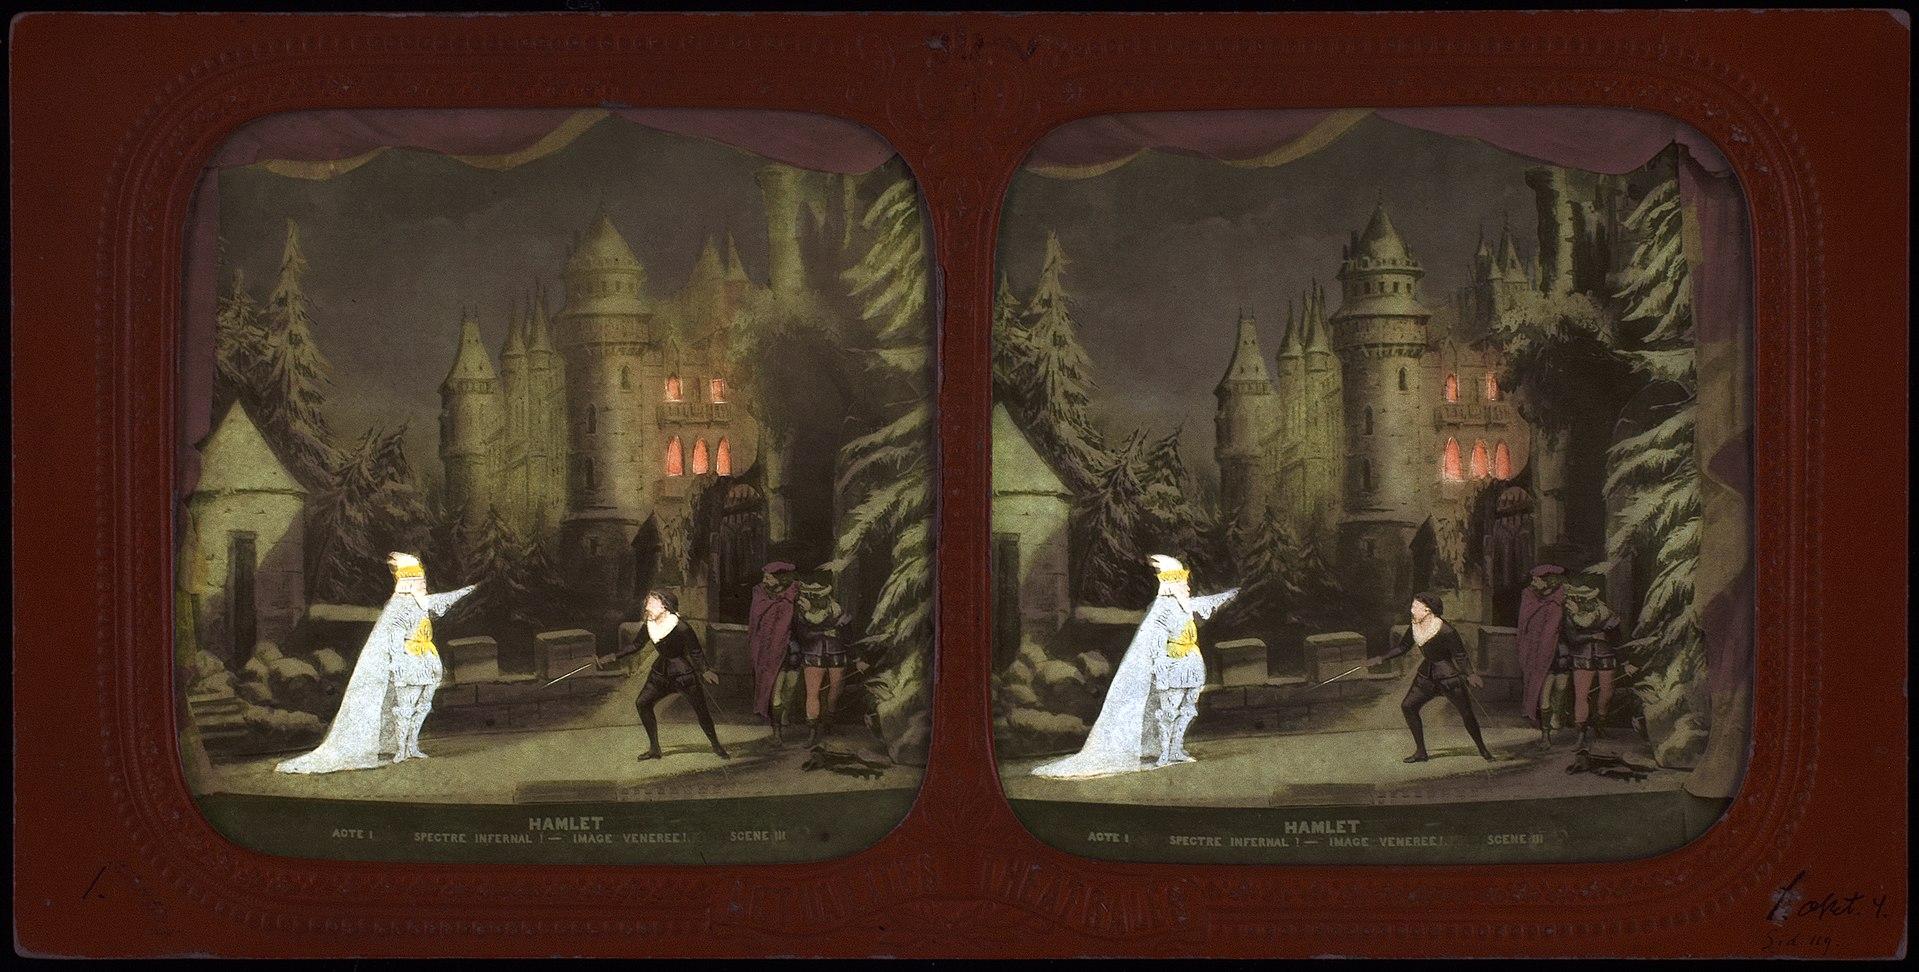 lossy-page1-1920px-Stereokort,_Hamlet_1,_acte_I,_scène_III_-_SMV_-_S43b.tif.jpg